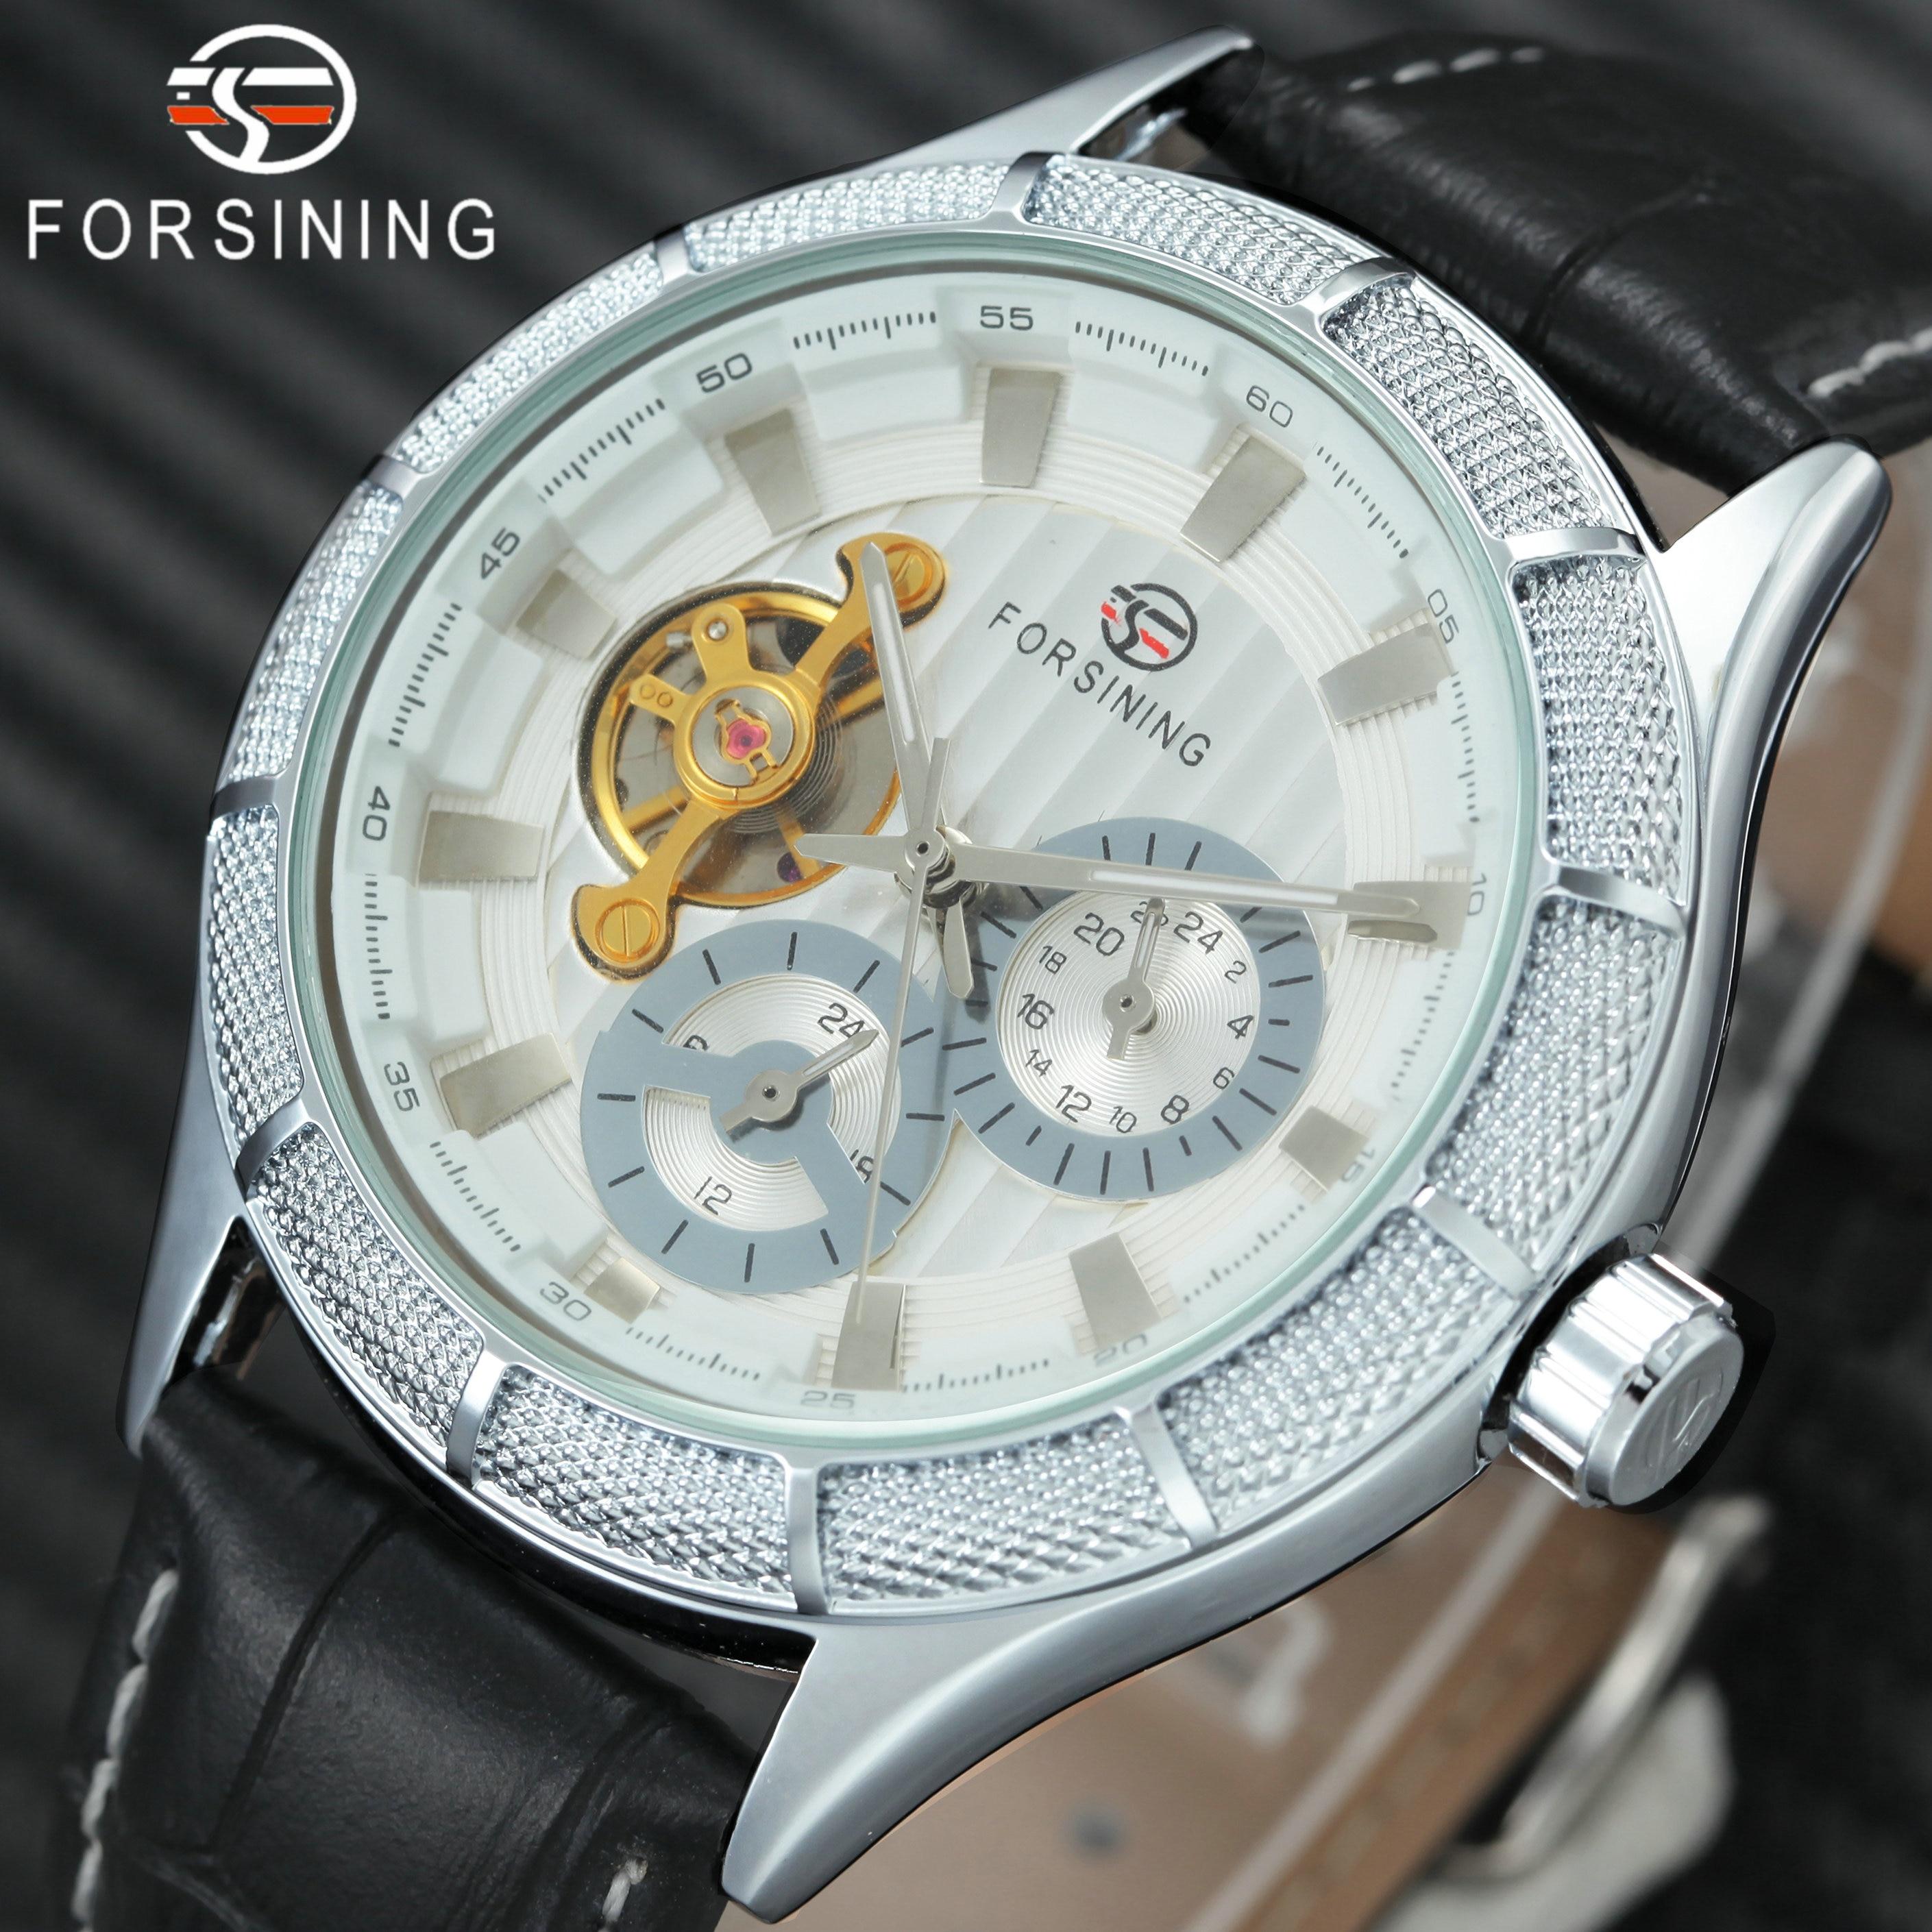 все цены на FORSINING Top Brand Luxury Tourbillon Skeleton Mechanical Watch Men Leather Strap 2 Sub-dials Fashion Classic Wrist Watches 2018 онлайн